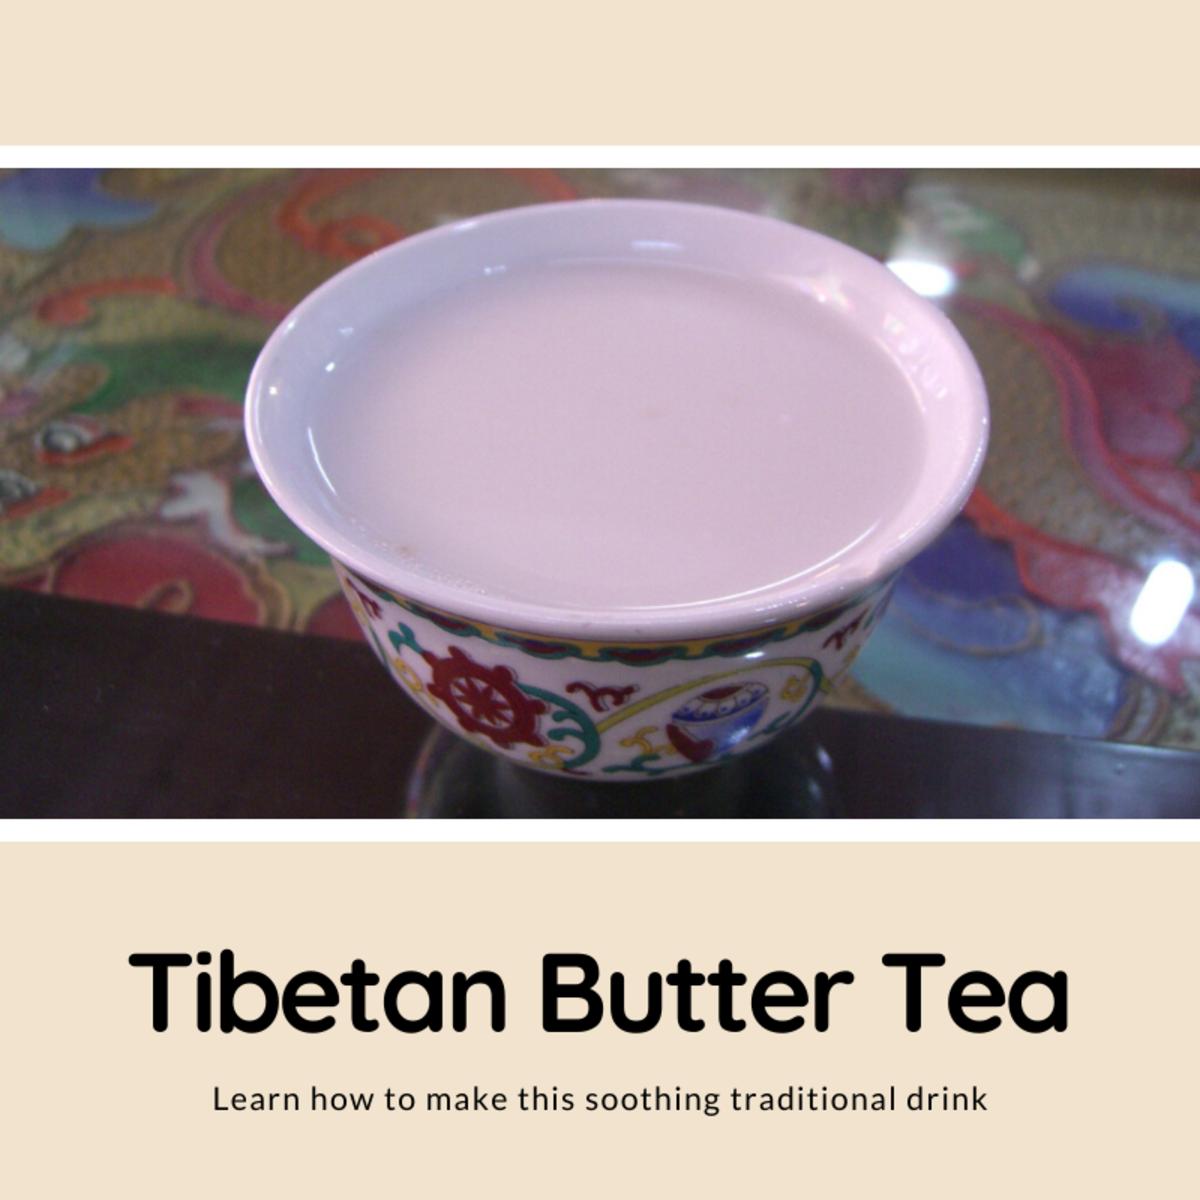 How to Make Tibetan Butter Tea